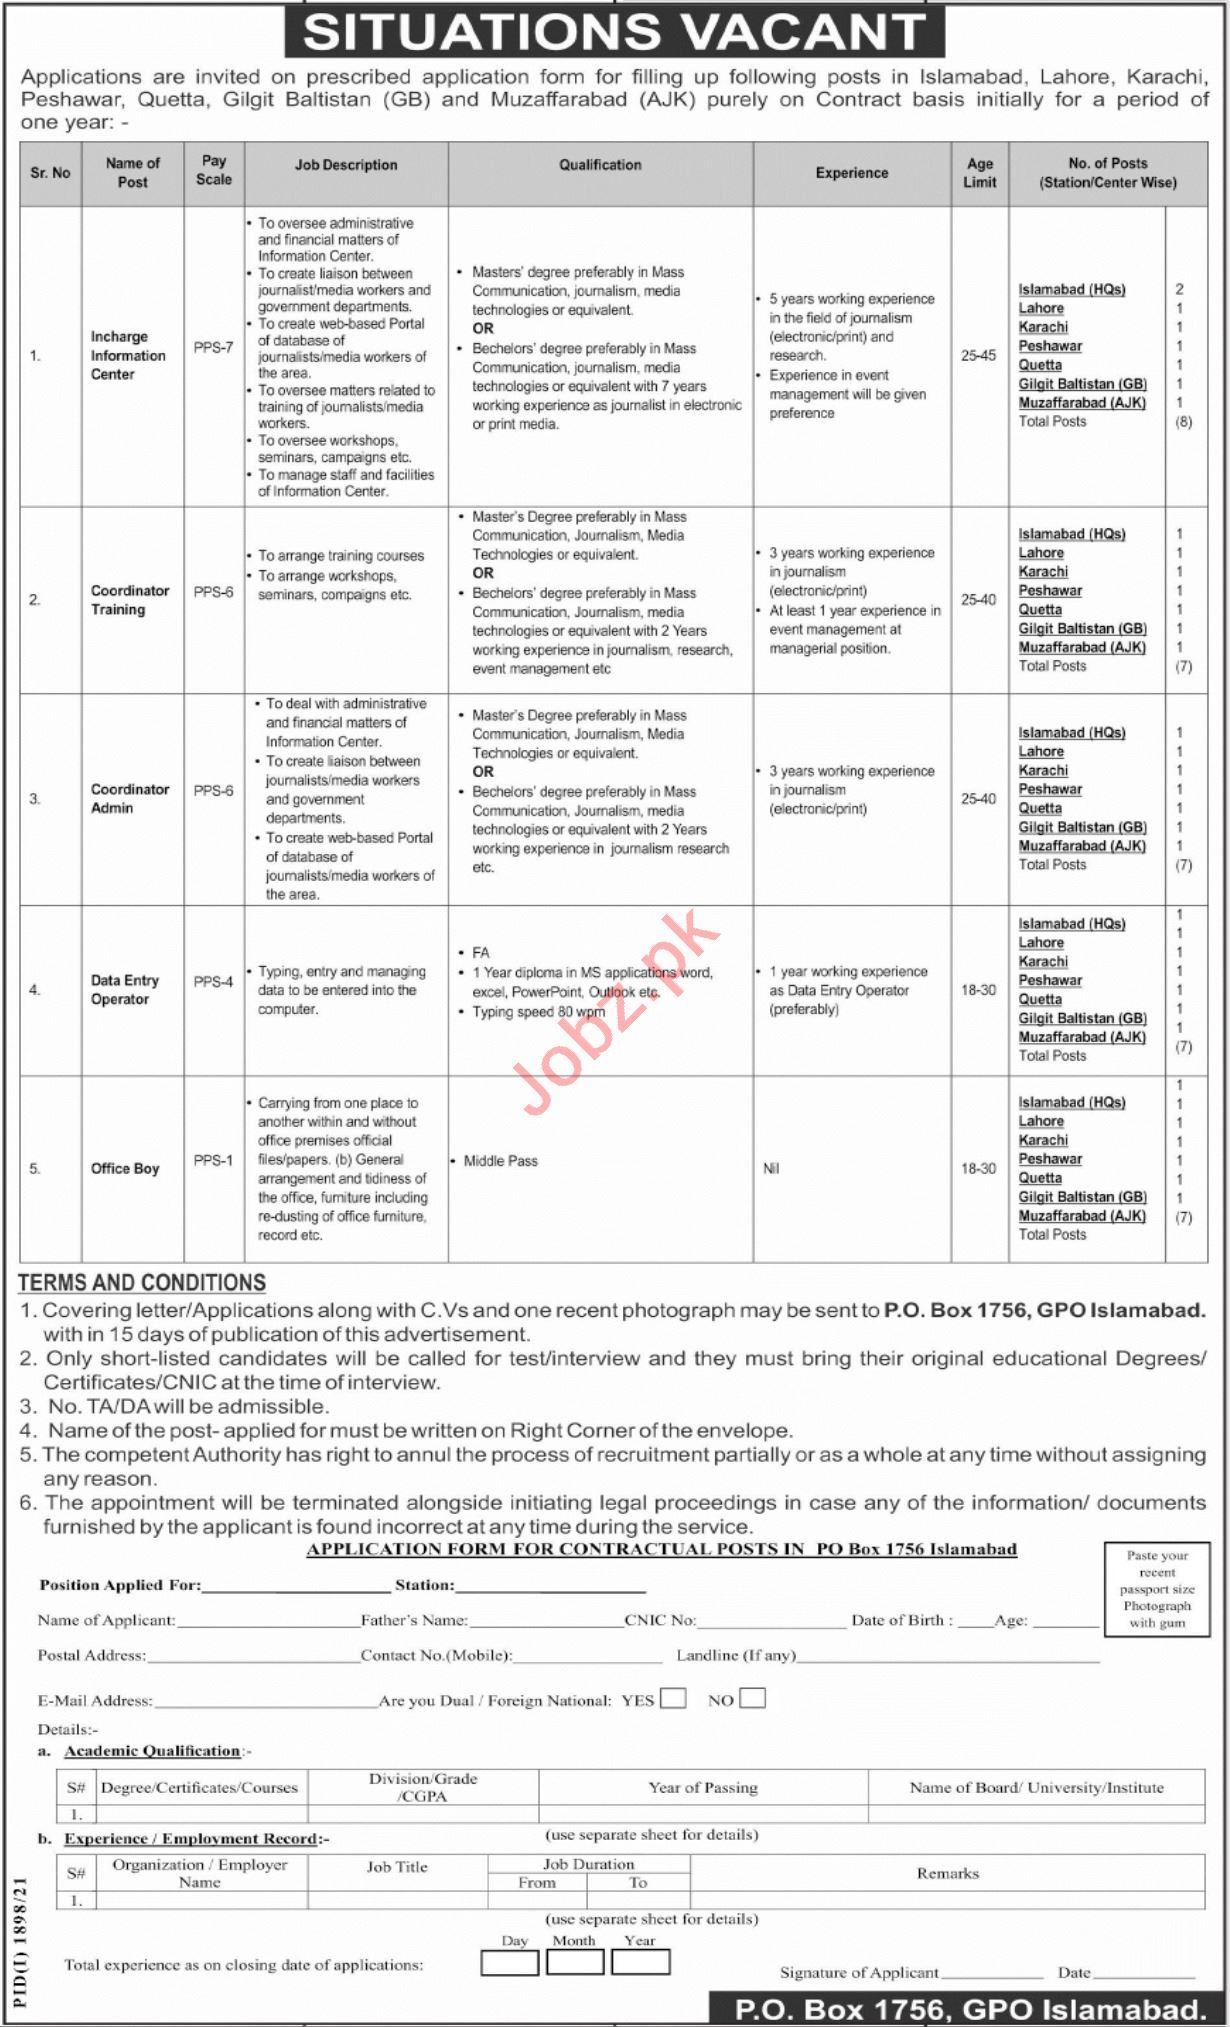 P O Box No 1756 GPO Islamabad Jobs 2021